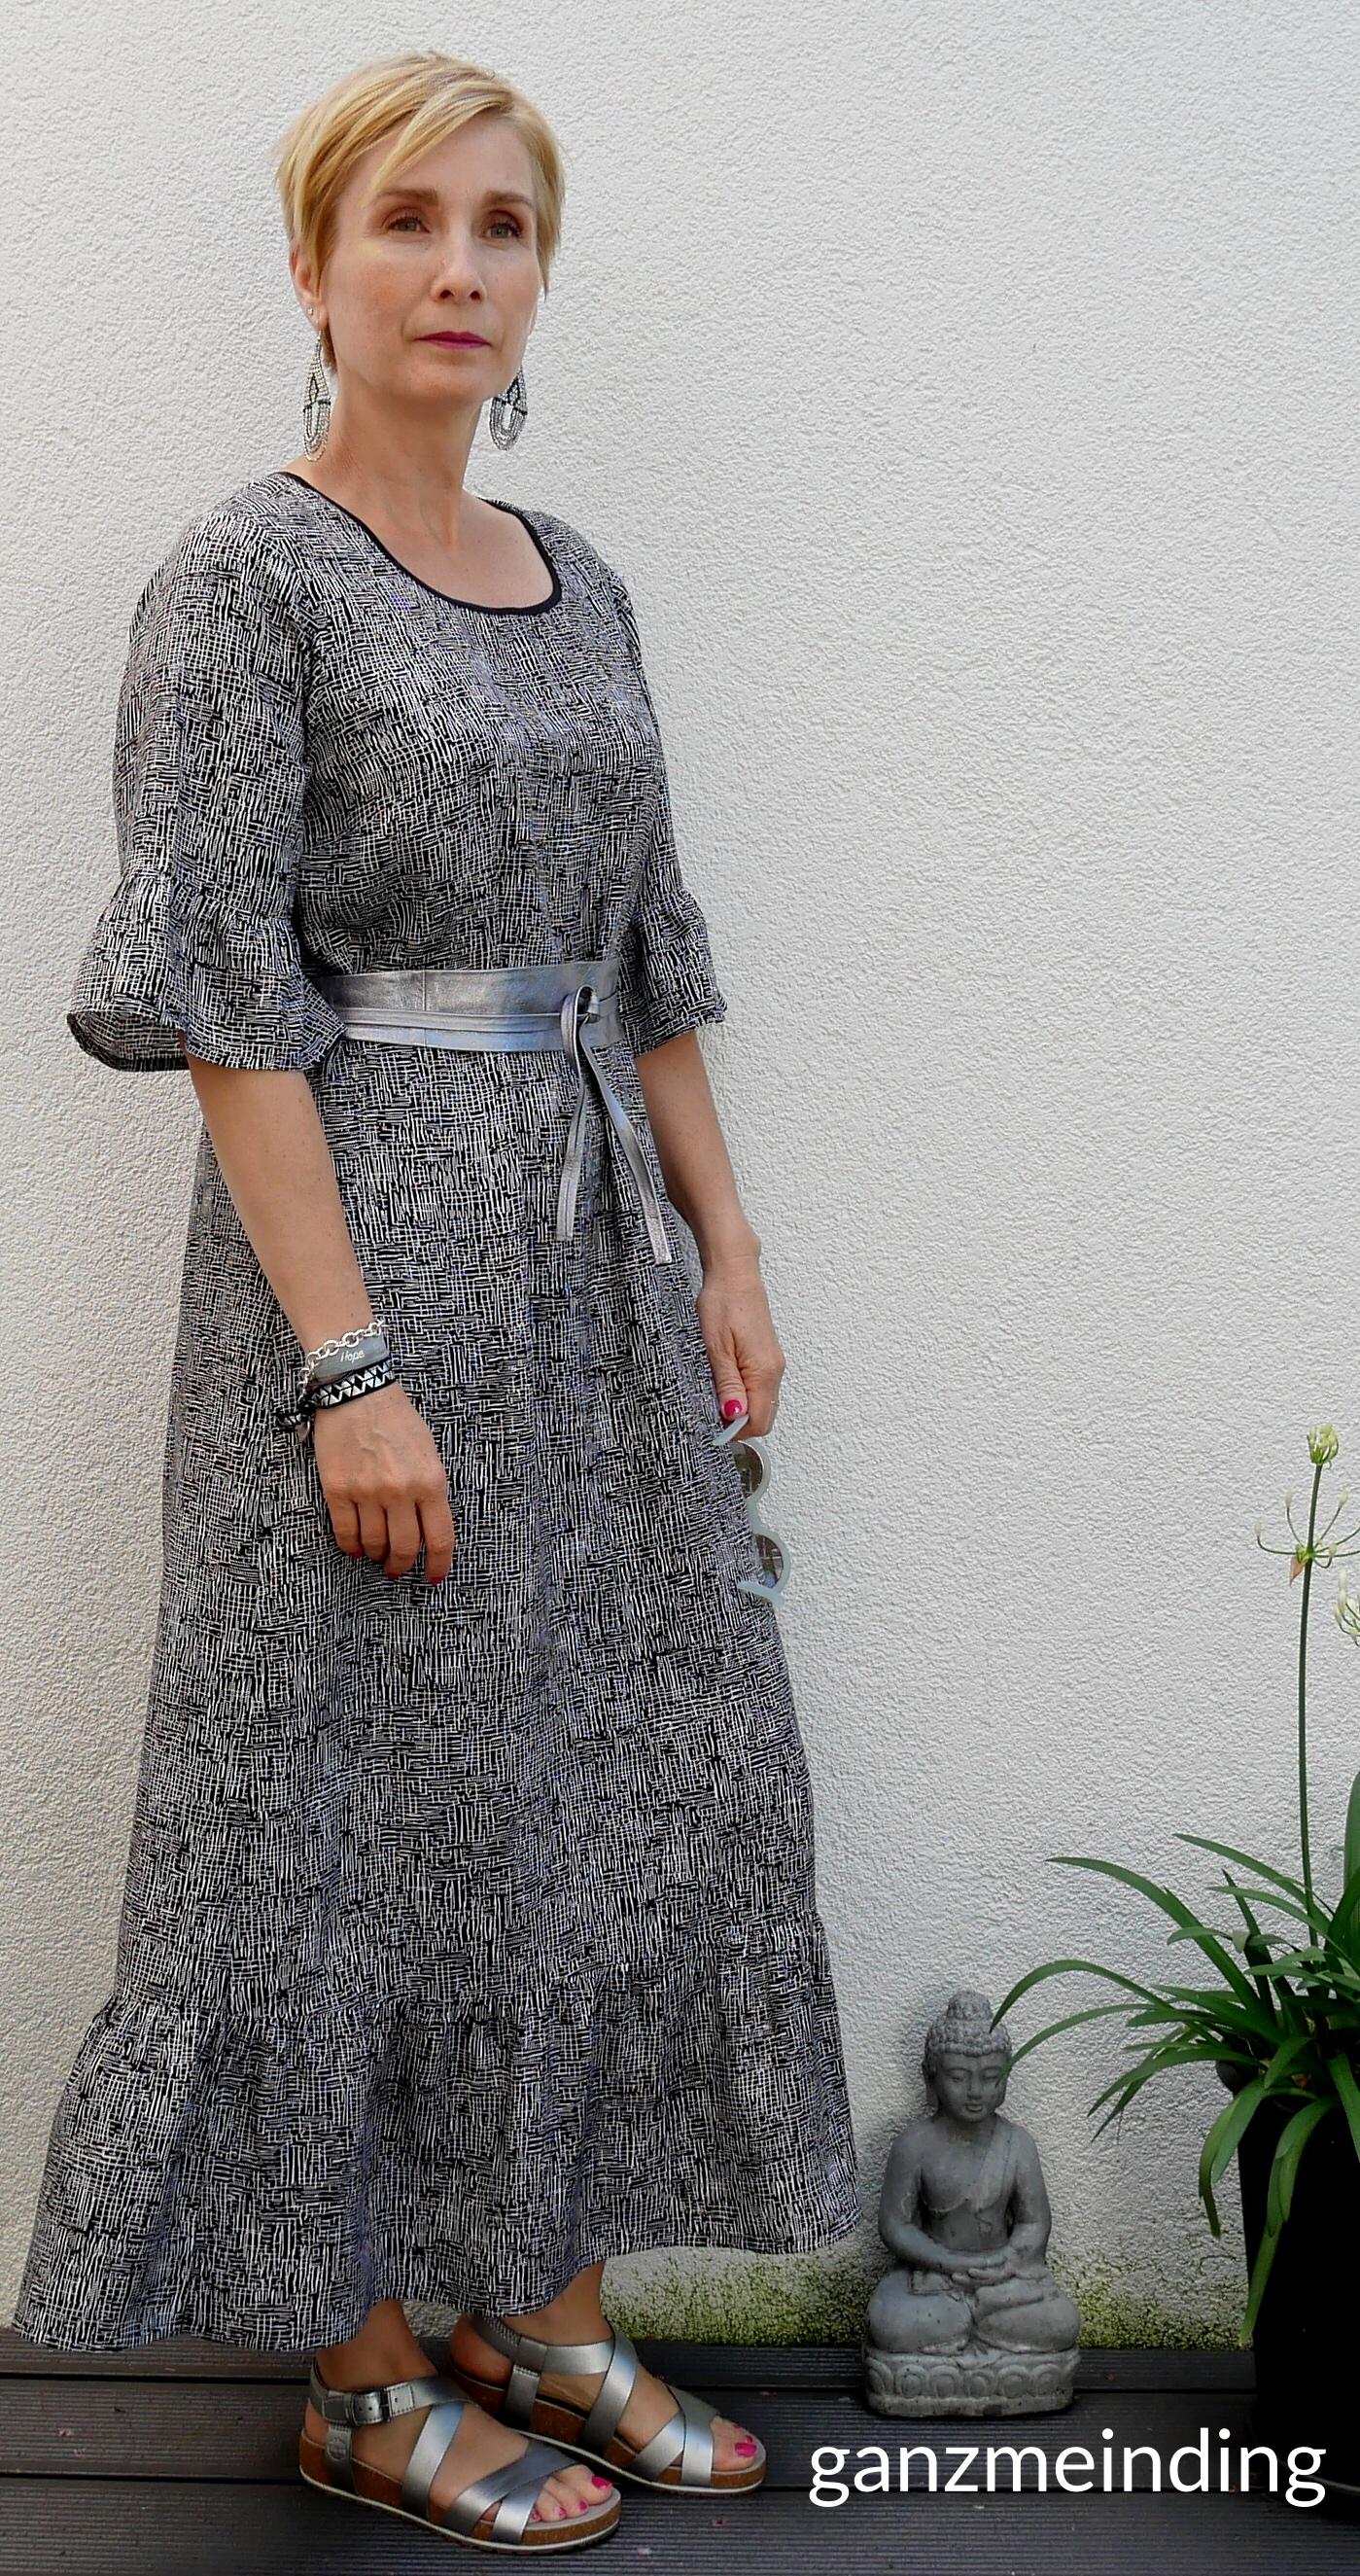 Kleid mit Rüschen, Dana Lübke, Tutorial Ruffler Bernina, ganzmeinding 25